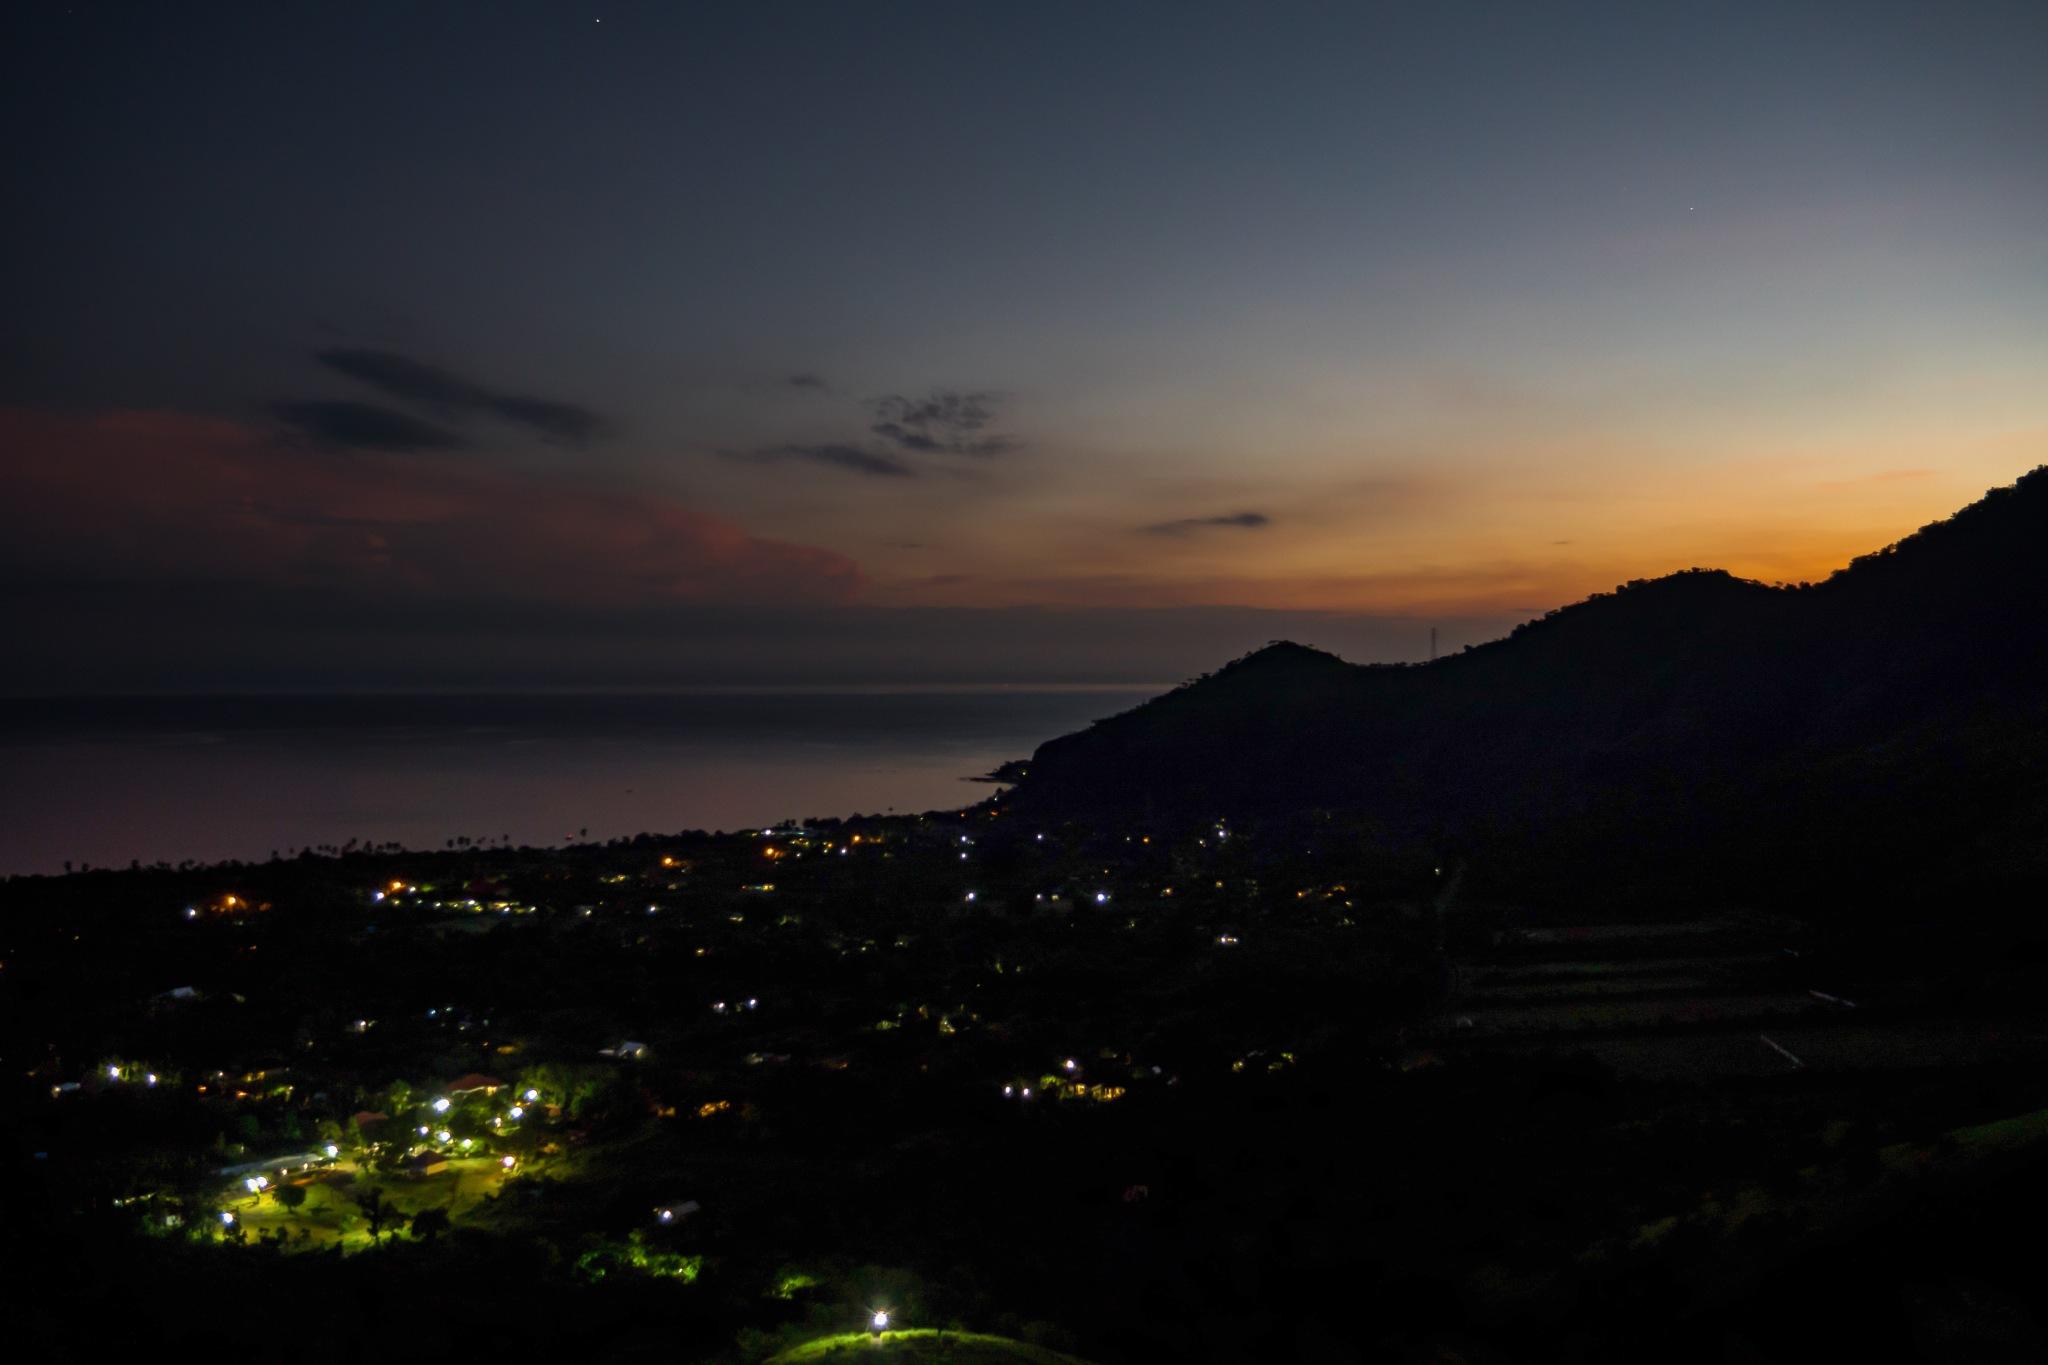 First light by Yoshua Surjo